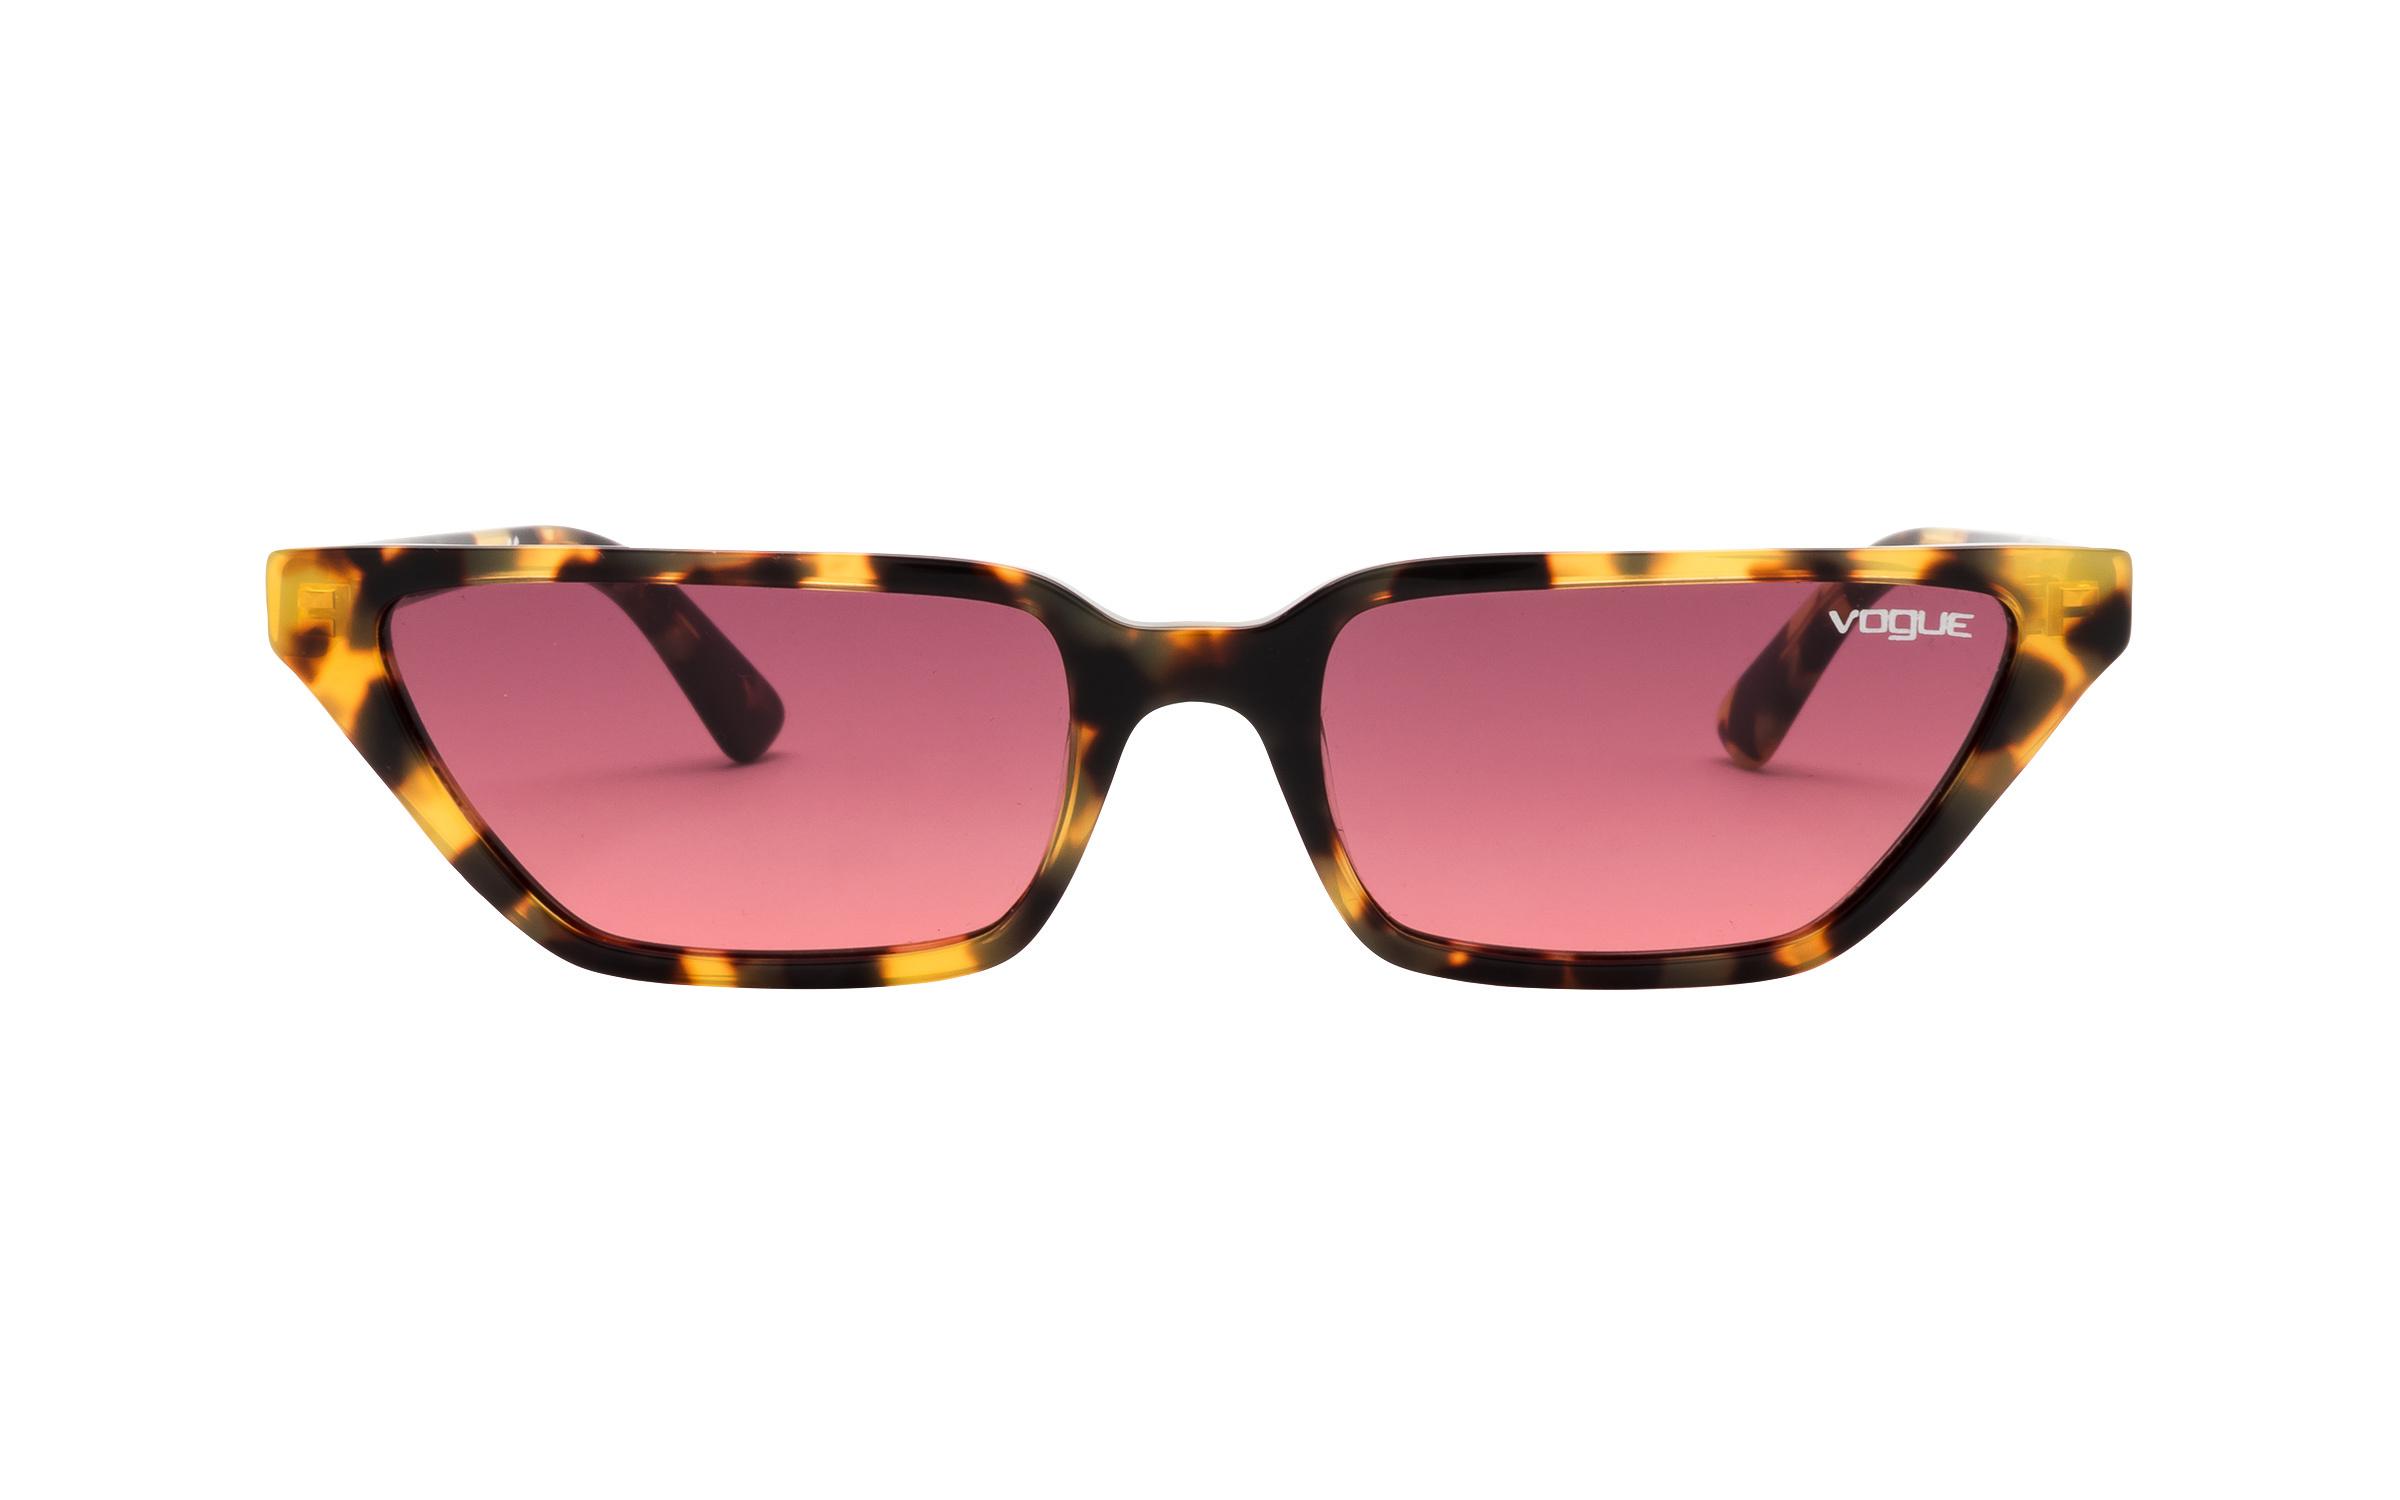 http://www.coastal.com/ - Luxottica Vogue VO5235-S 2605/20 53 Sunglasses in Brown Yellow Yellow/Tortoise – Online Coastal